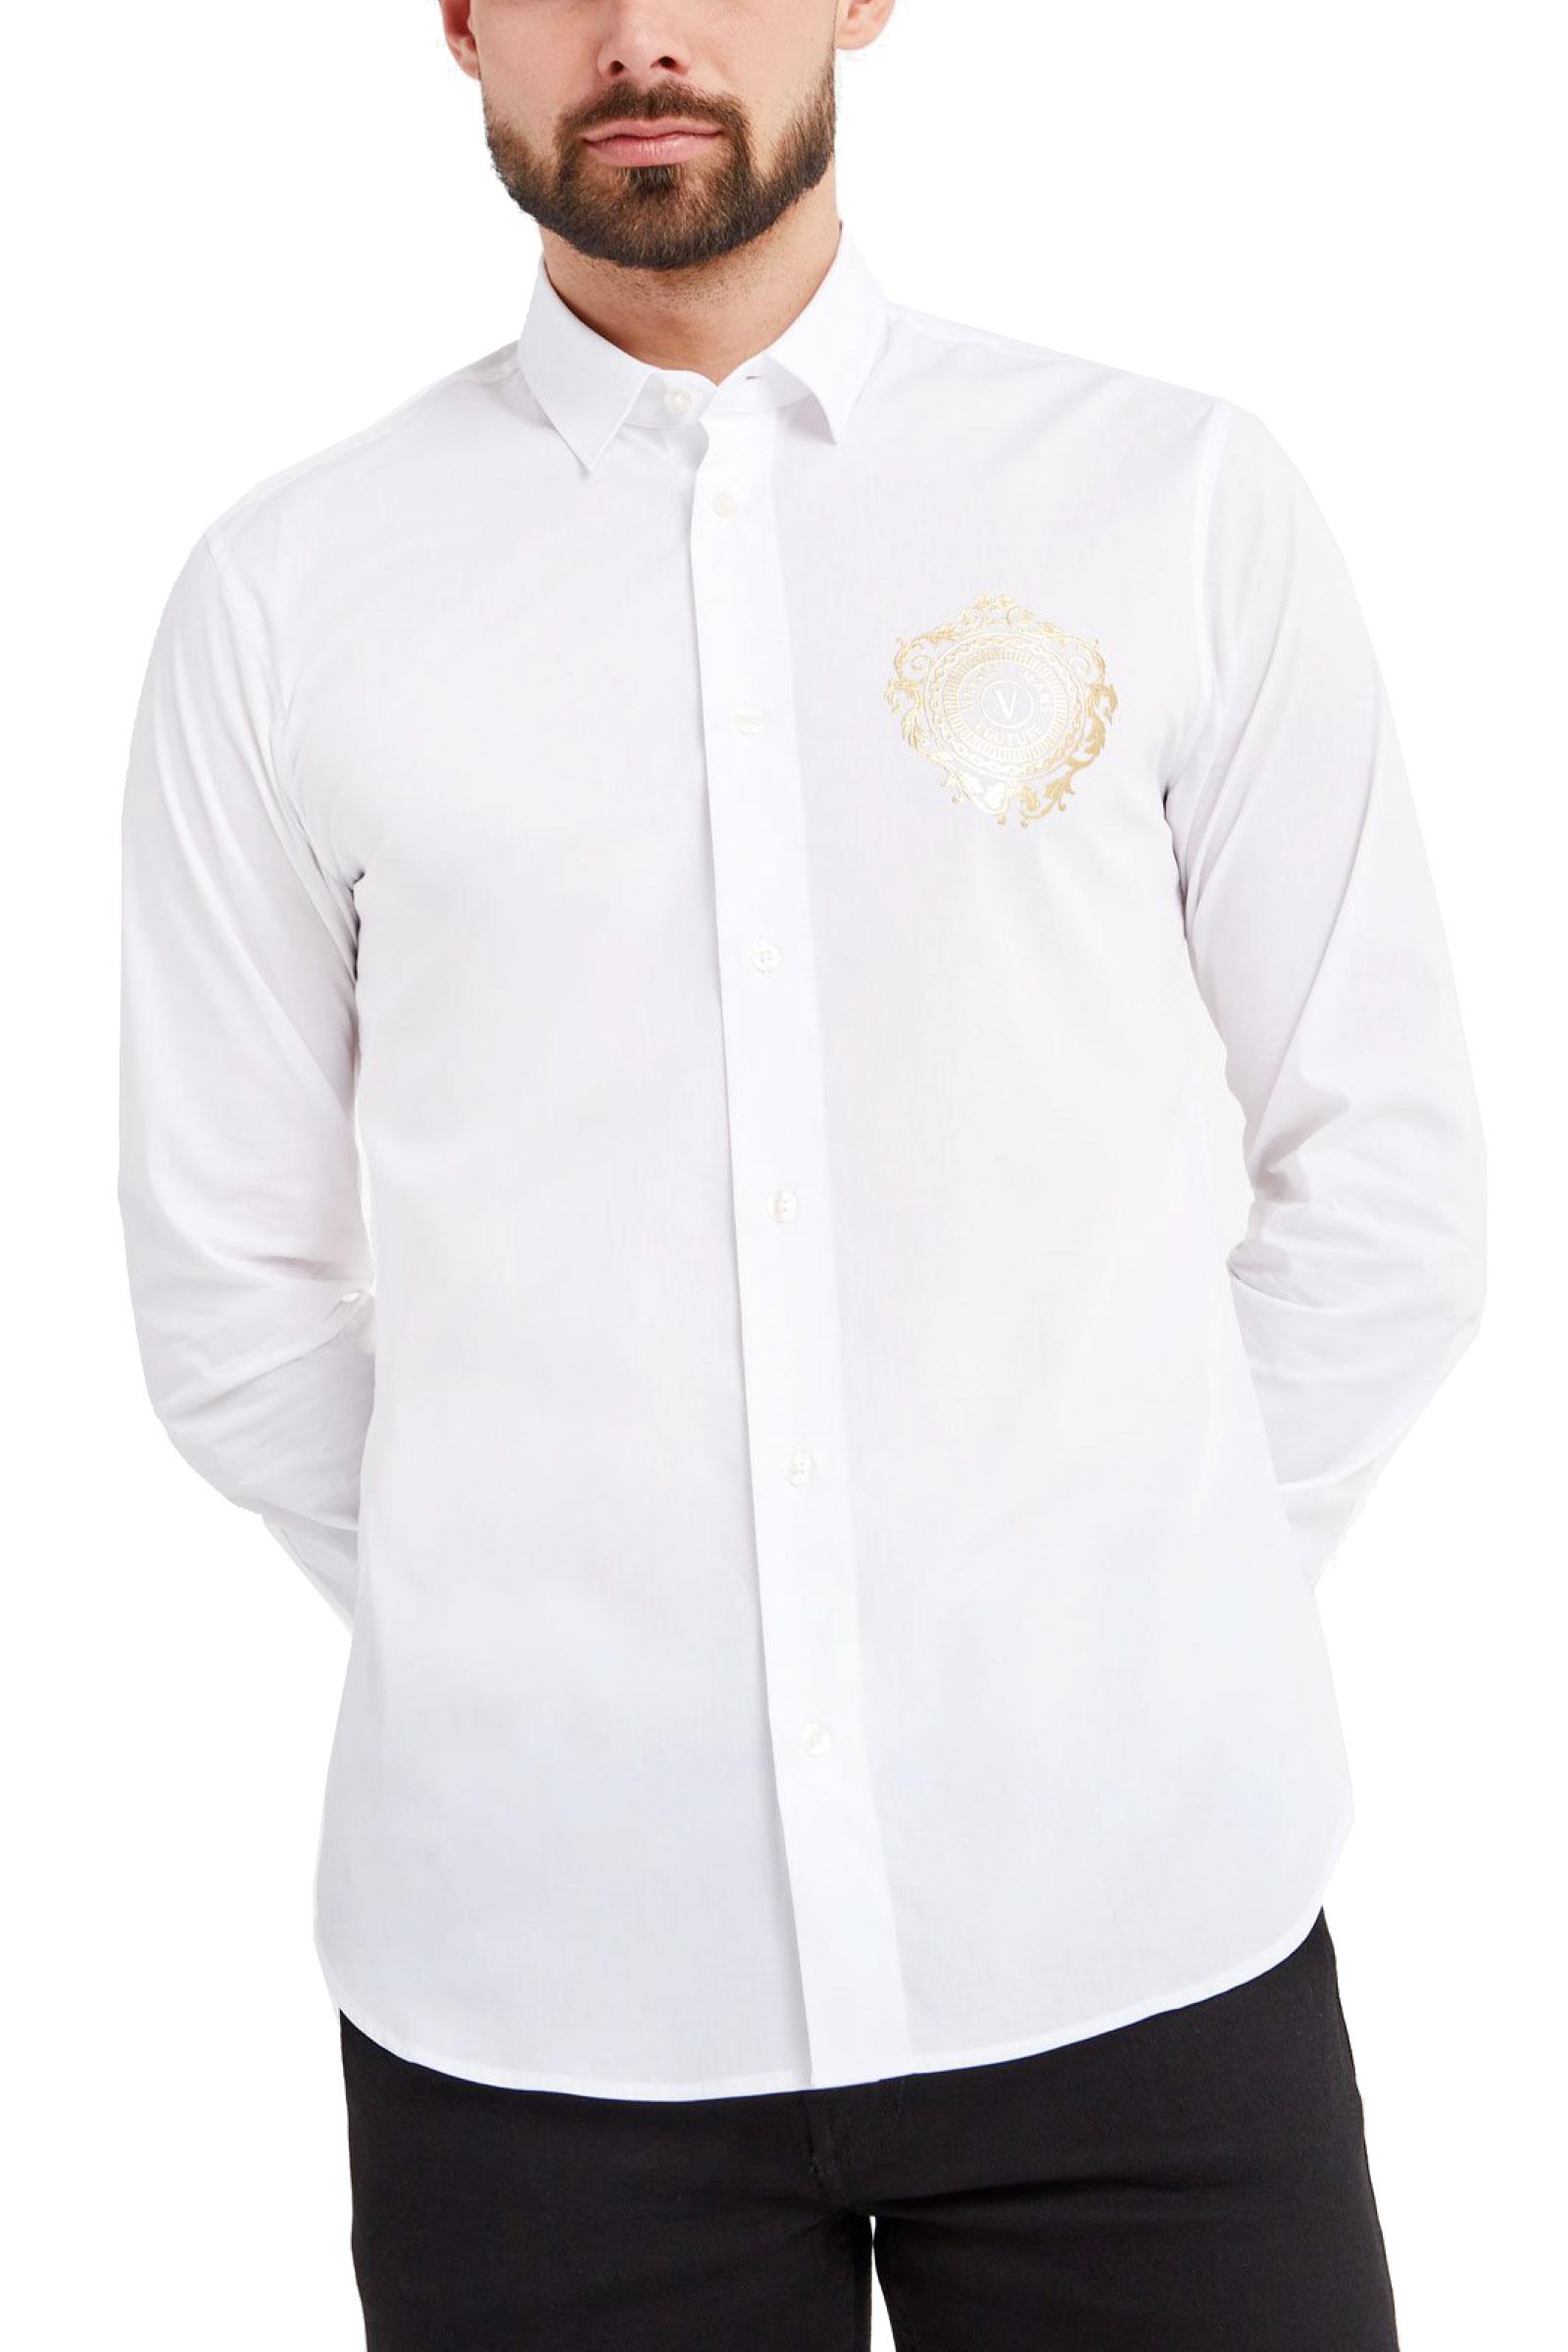 VERSACE JEANS COUTURE Camicia Uomo VERSACE JEANS COUTURE | Camicia | B1GWA6S5304213